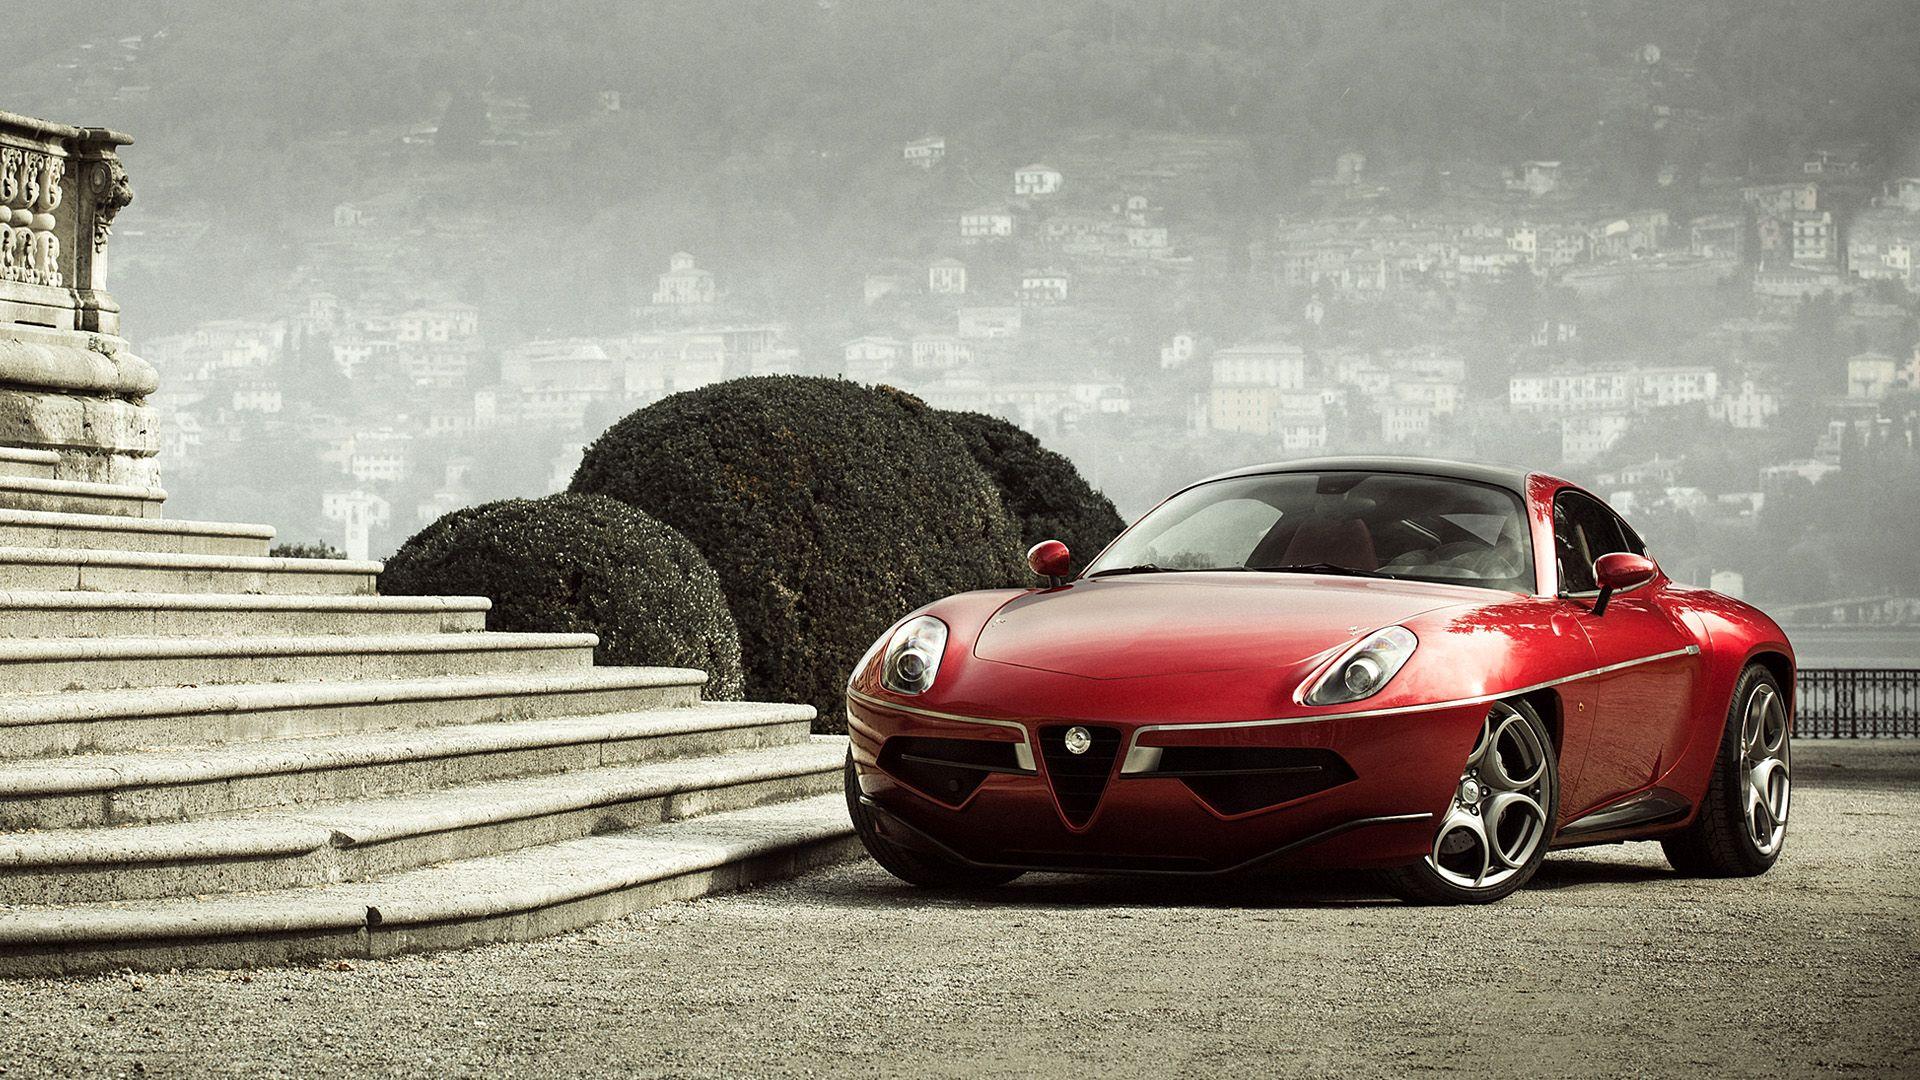 Alfa Romeo Disco Volante By Superleggera Alfa Romeo Car Guys New Car Picture